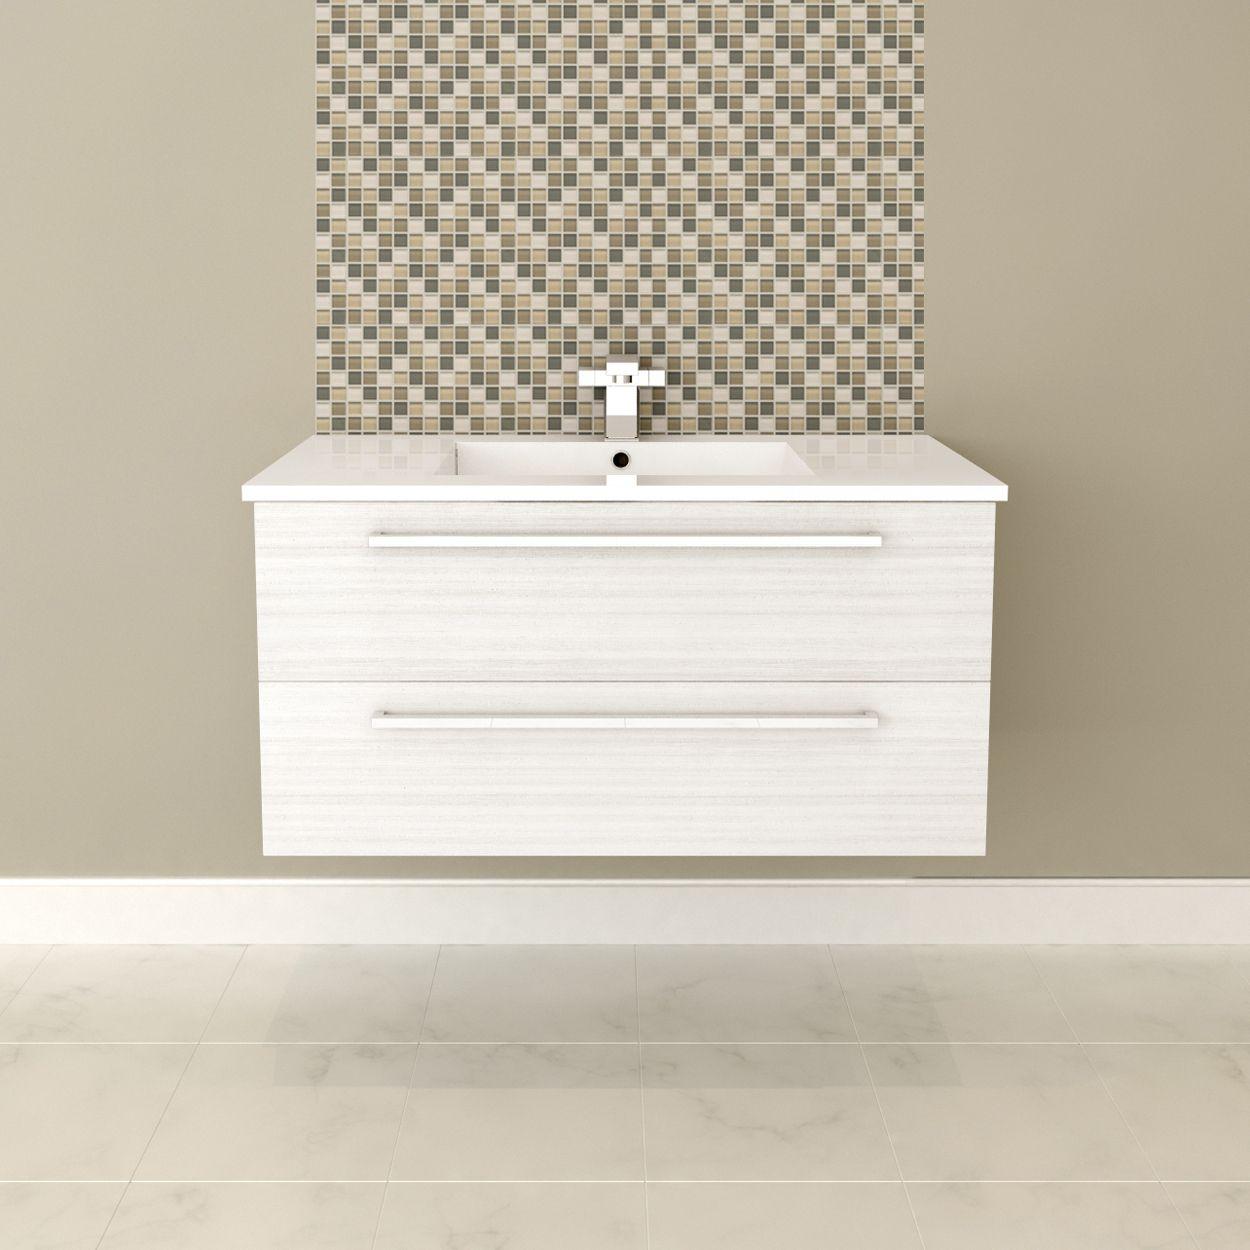 Shop Cutler Kitchen Amp Bath Cutler Silhouette Fv Zamubkka48 48 In X 19 In Single Sink Bathroom Vanity With Cultured Wall Hung Vanity Bathroom Vanity Vanity